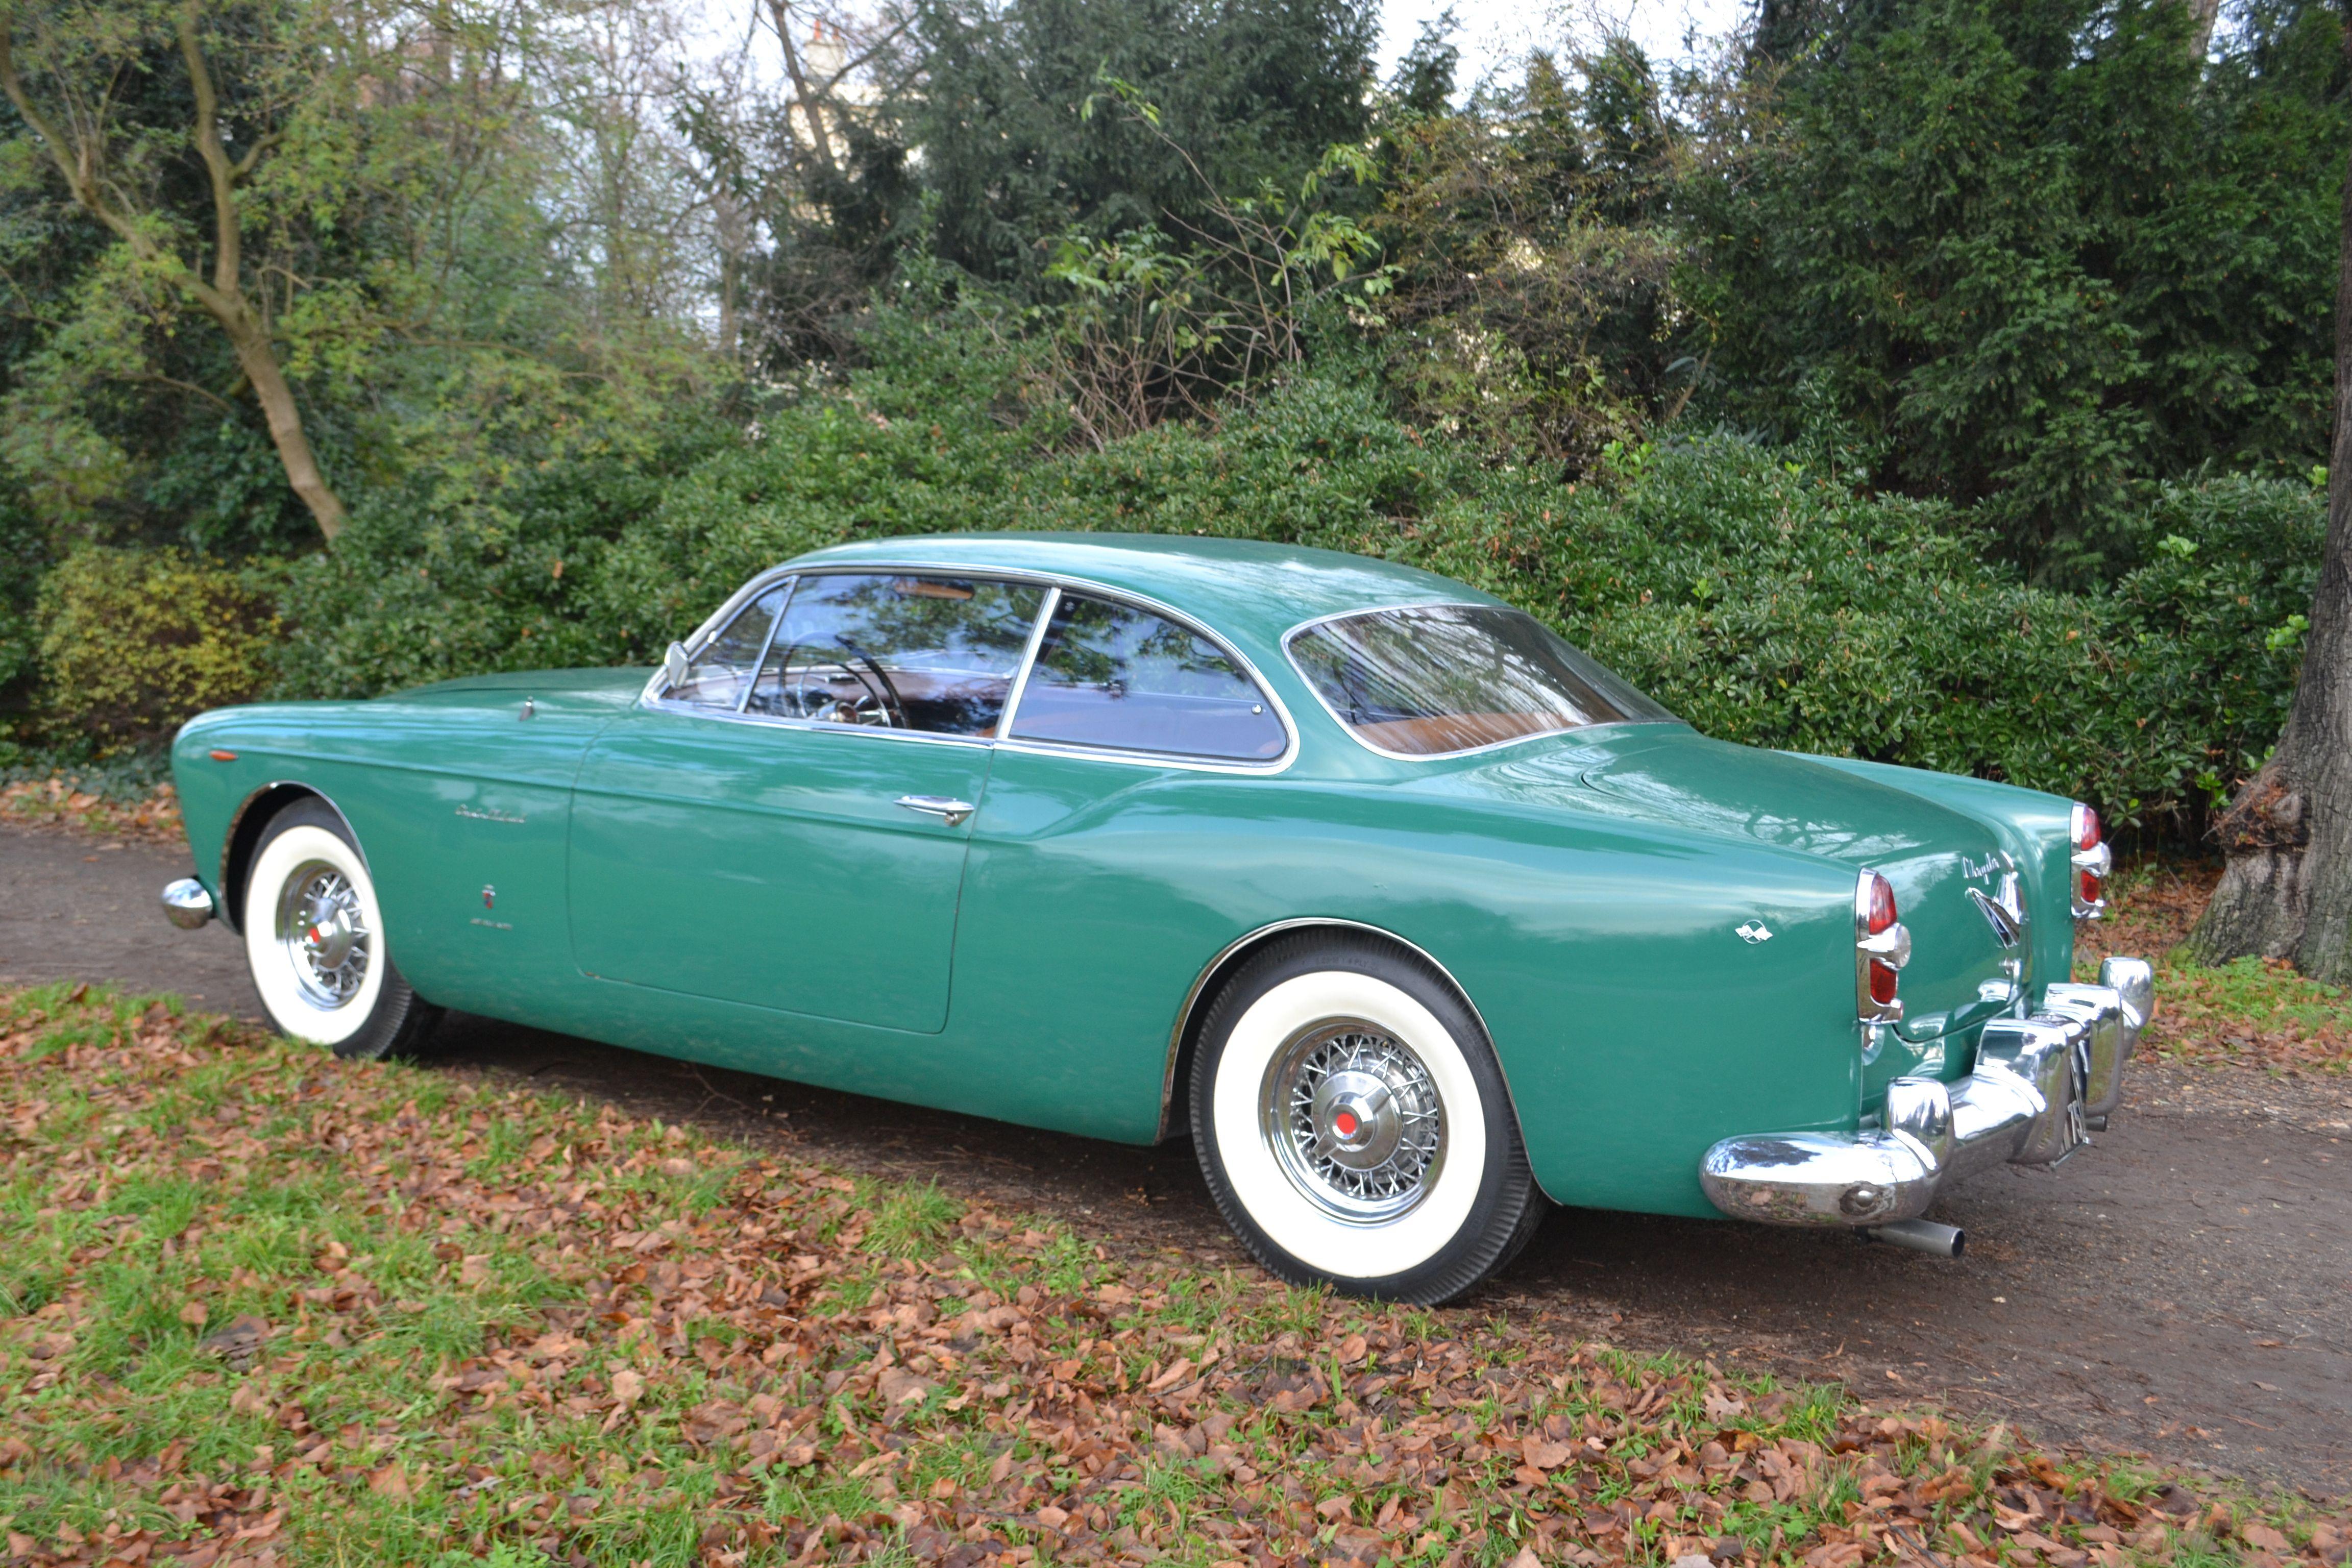 Rare Chrysler Ghia ST Special 1954-55 Italian delivery via Chrysler agent Autofamosa. 1 of 2 known to survive. Ghia Torino.